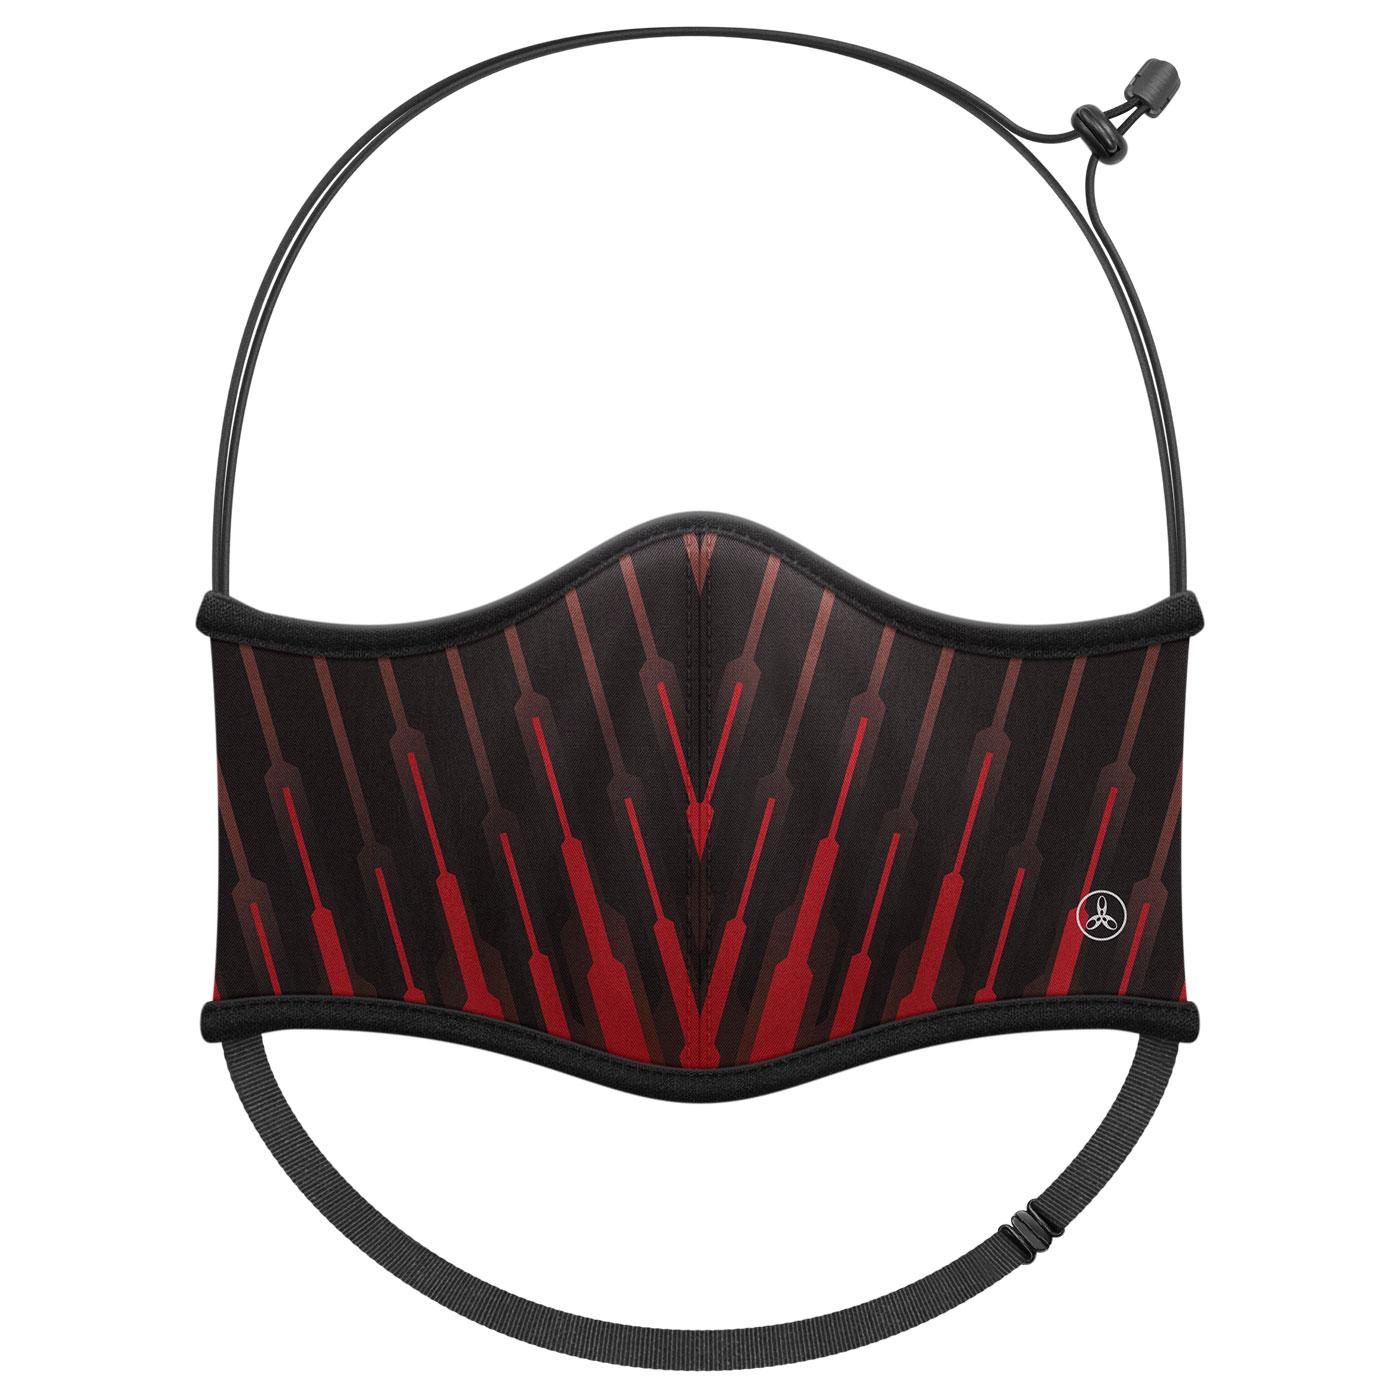 HODARLA 運動舒適口罩6032207 - 紅黑